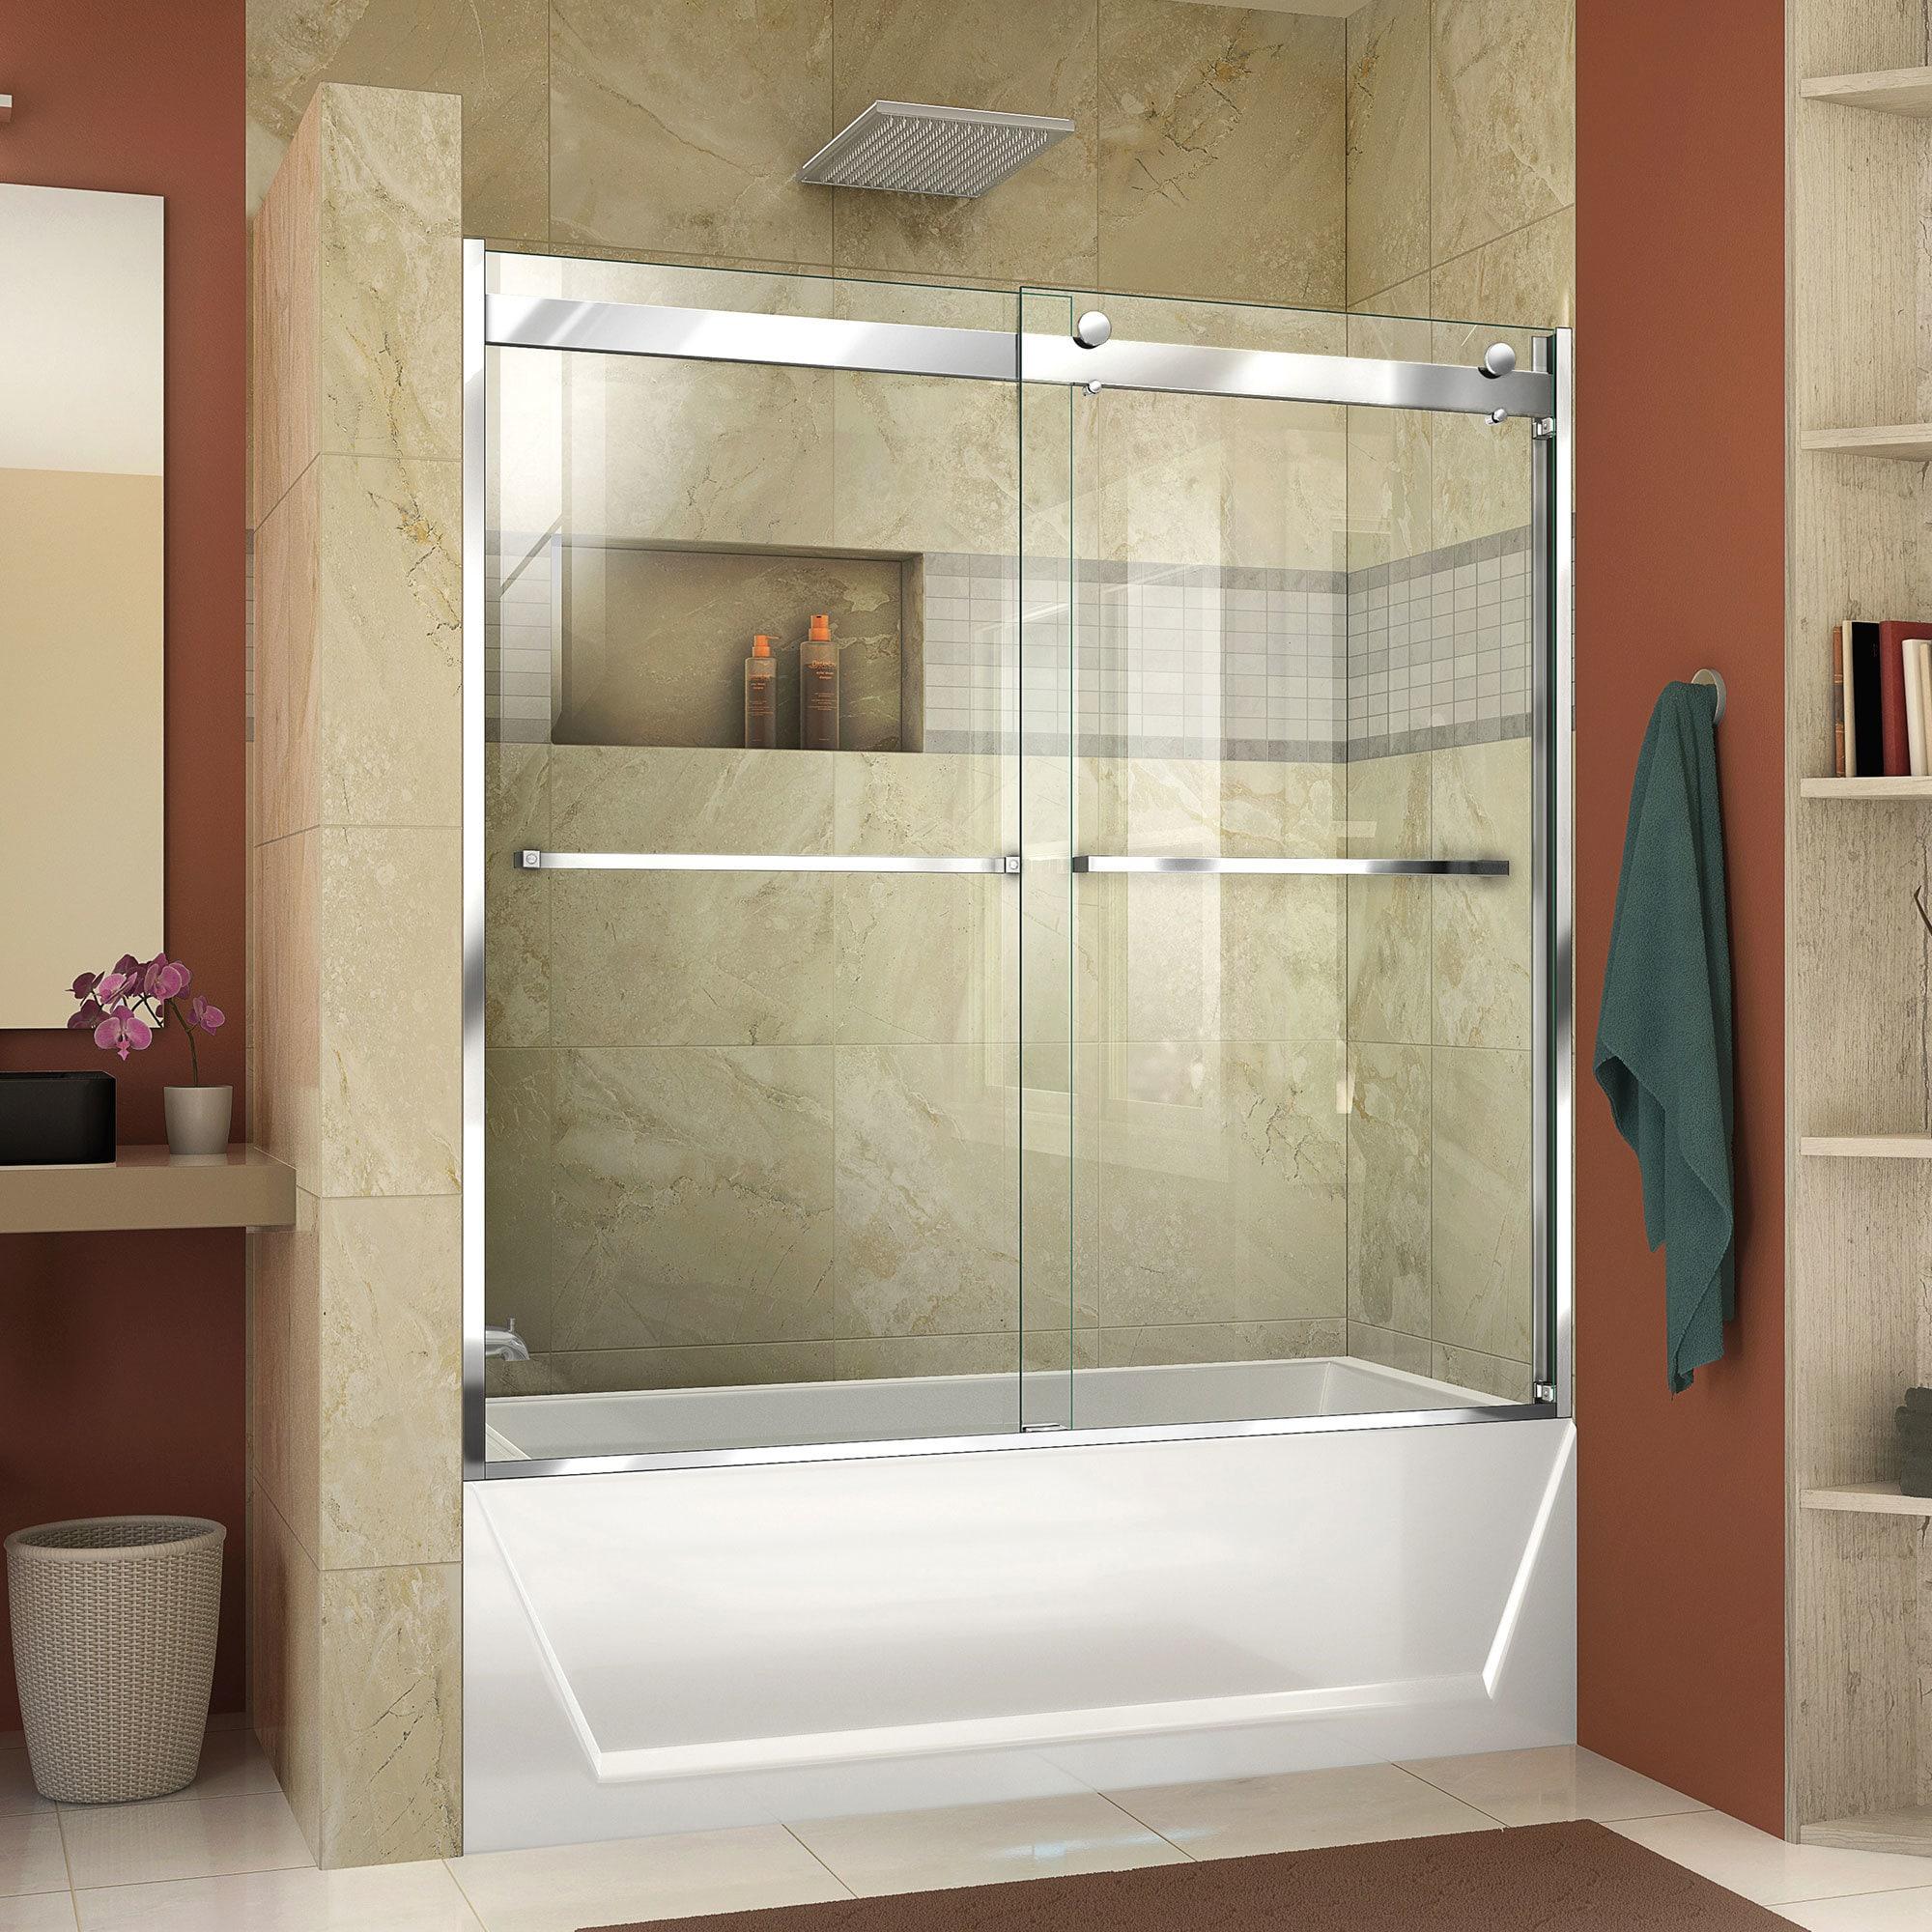 Shop DreamLine Essence-H 56-60 in. W x 60 in. H Frameless Bypass Tub ...